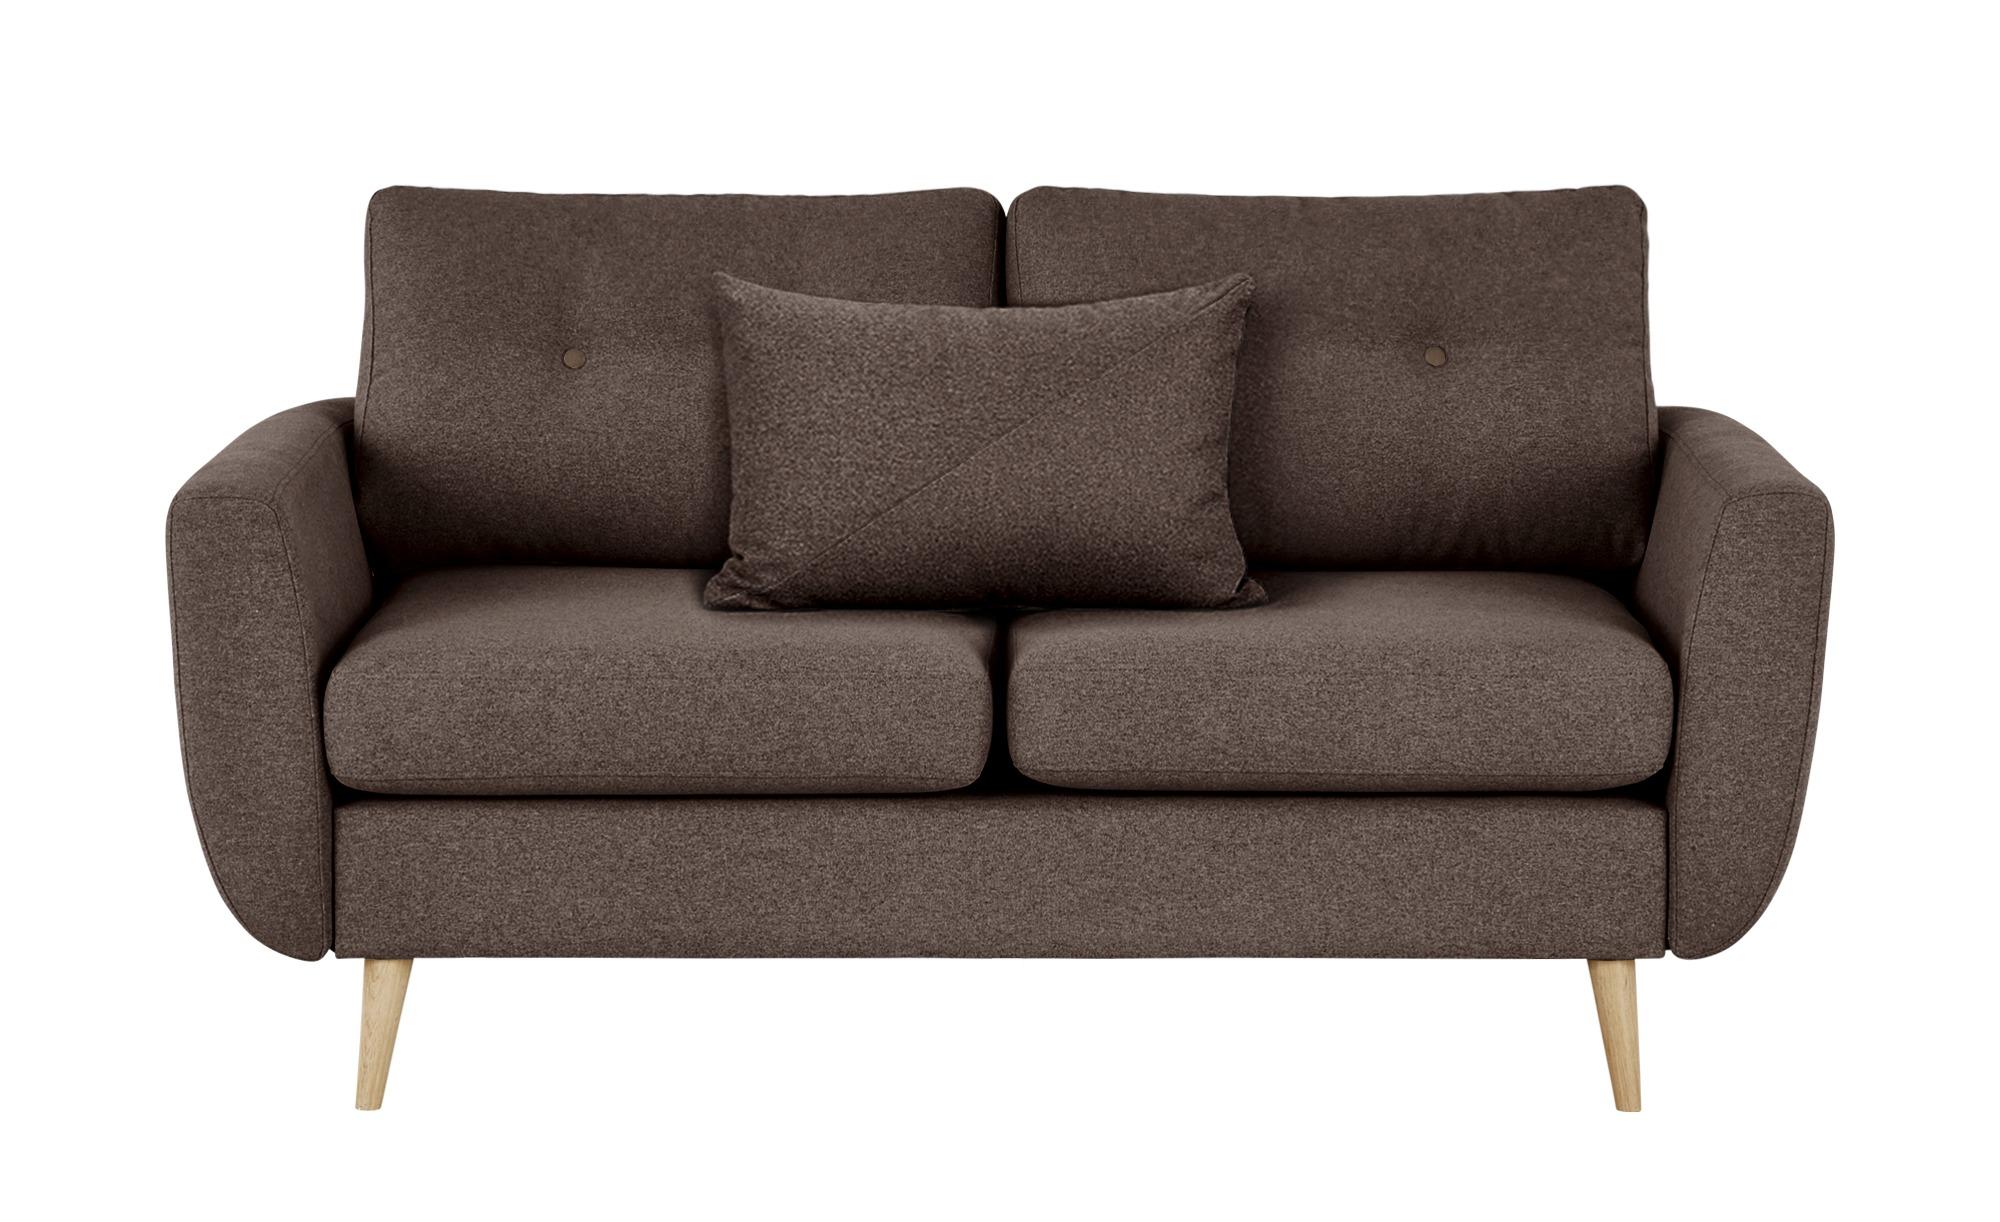 finya Sofa braun - Webstoff Harris ¦ blau ¦ Maße (cm): B: 161 H: 85 T: 92 Polstermöbel > Sofas > 2-Sitzer - Höffner